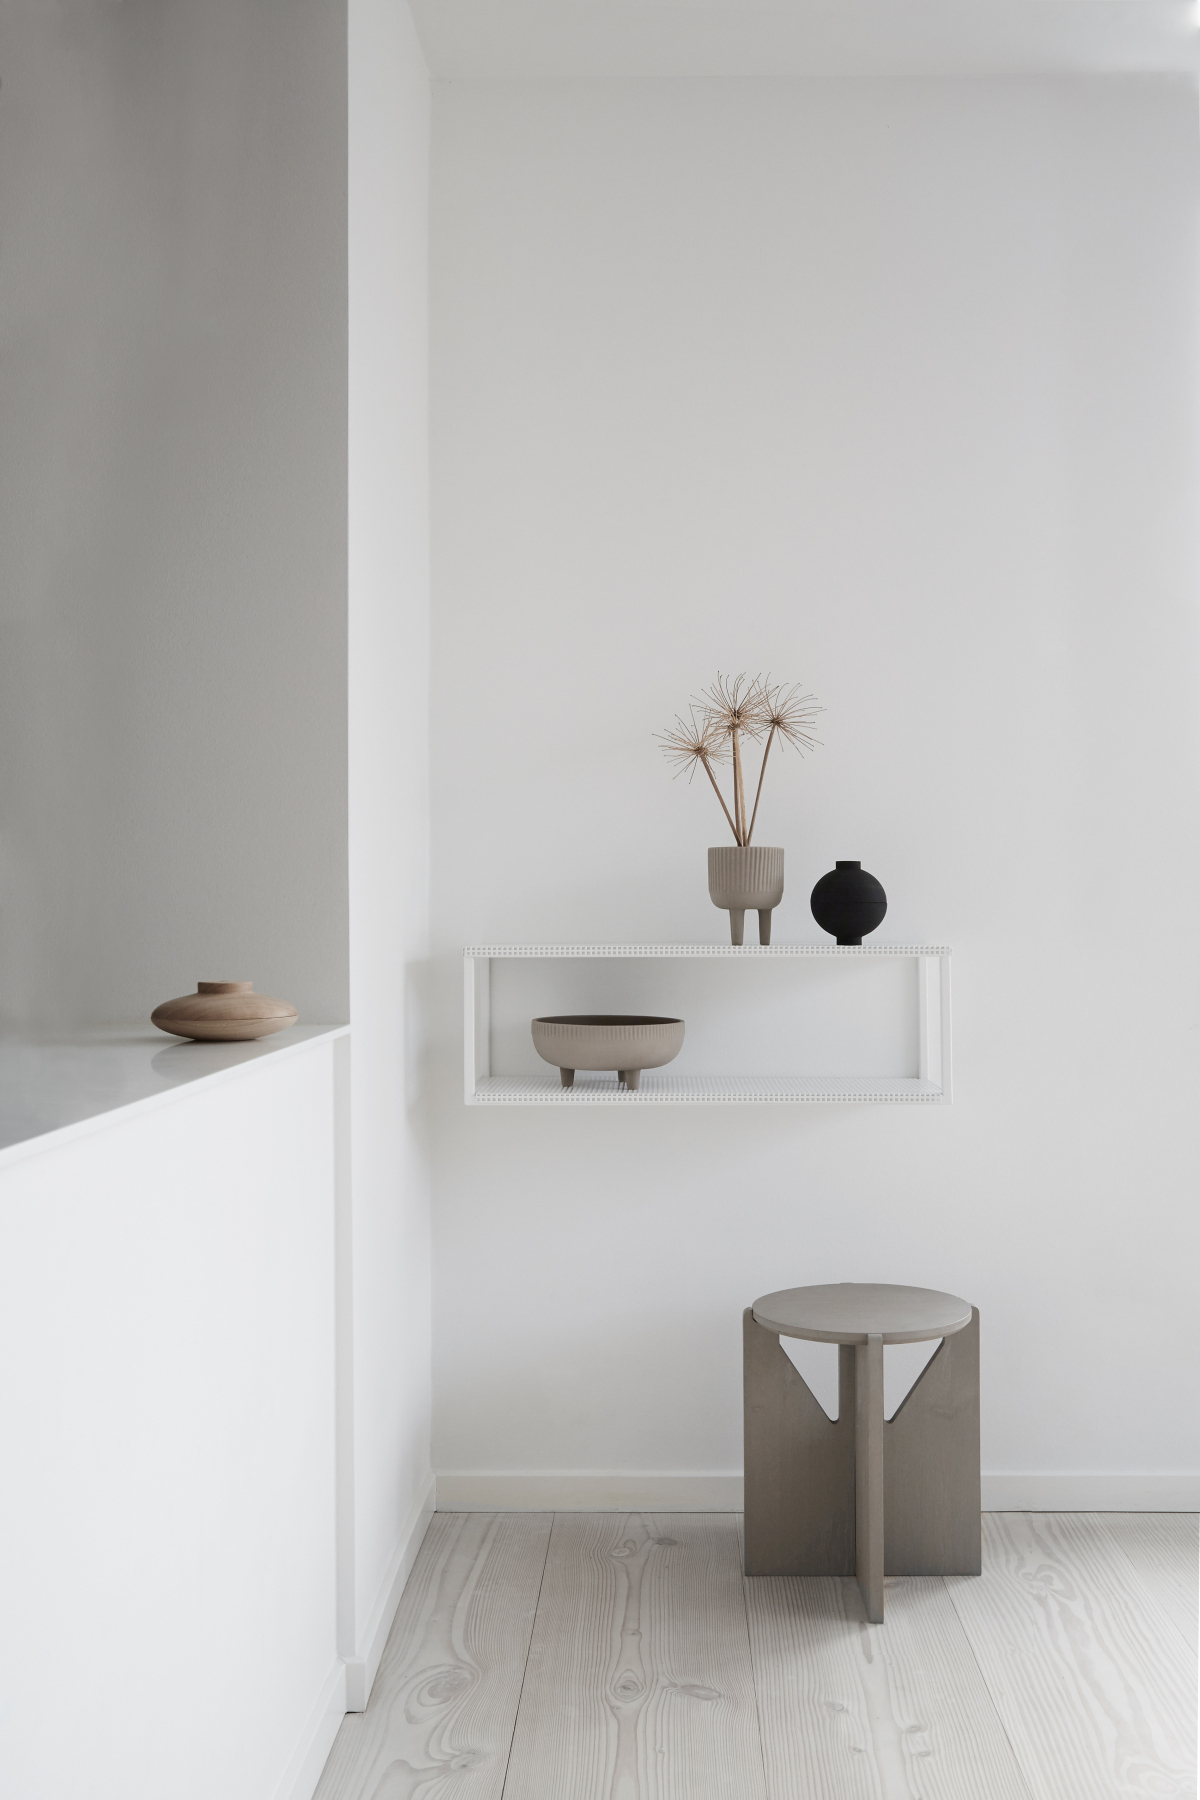 Accessoires aus Terrakotta und Holz | Foto: Kristina Dam Studio